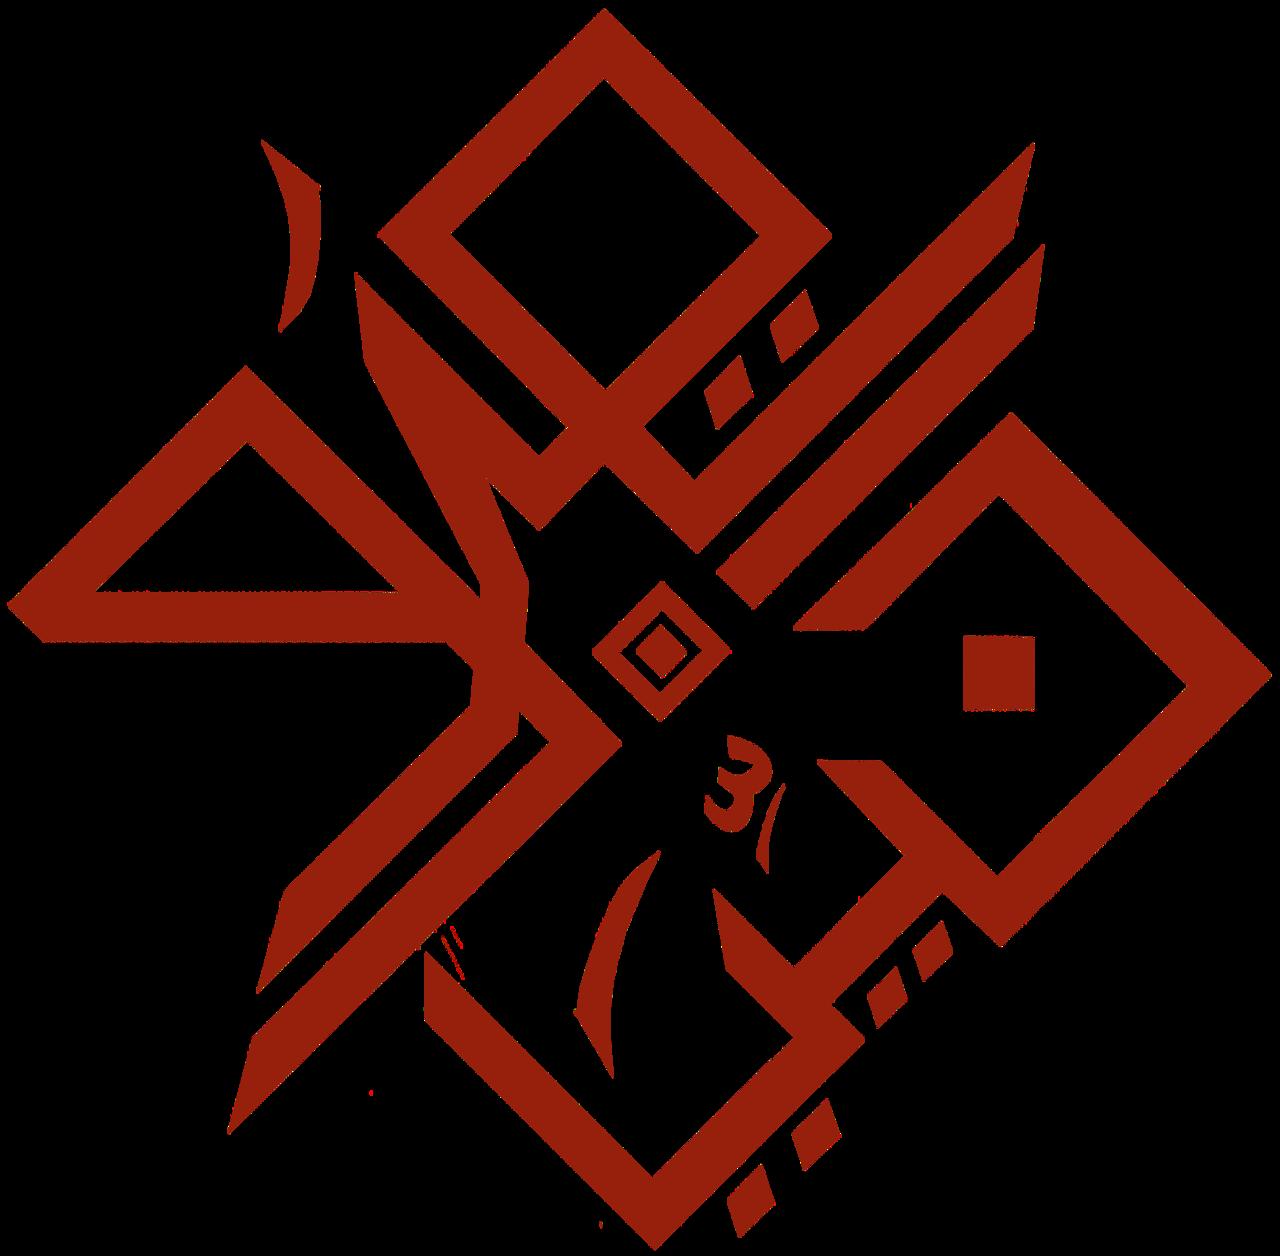 The Qarawiyyin Newsletter